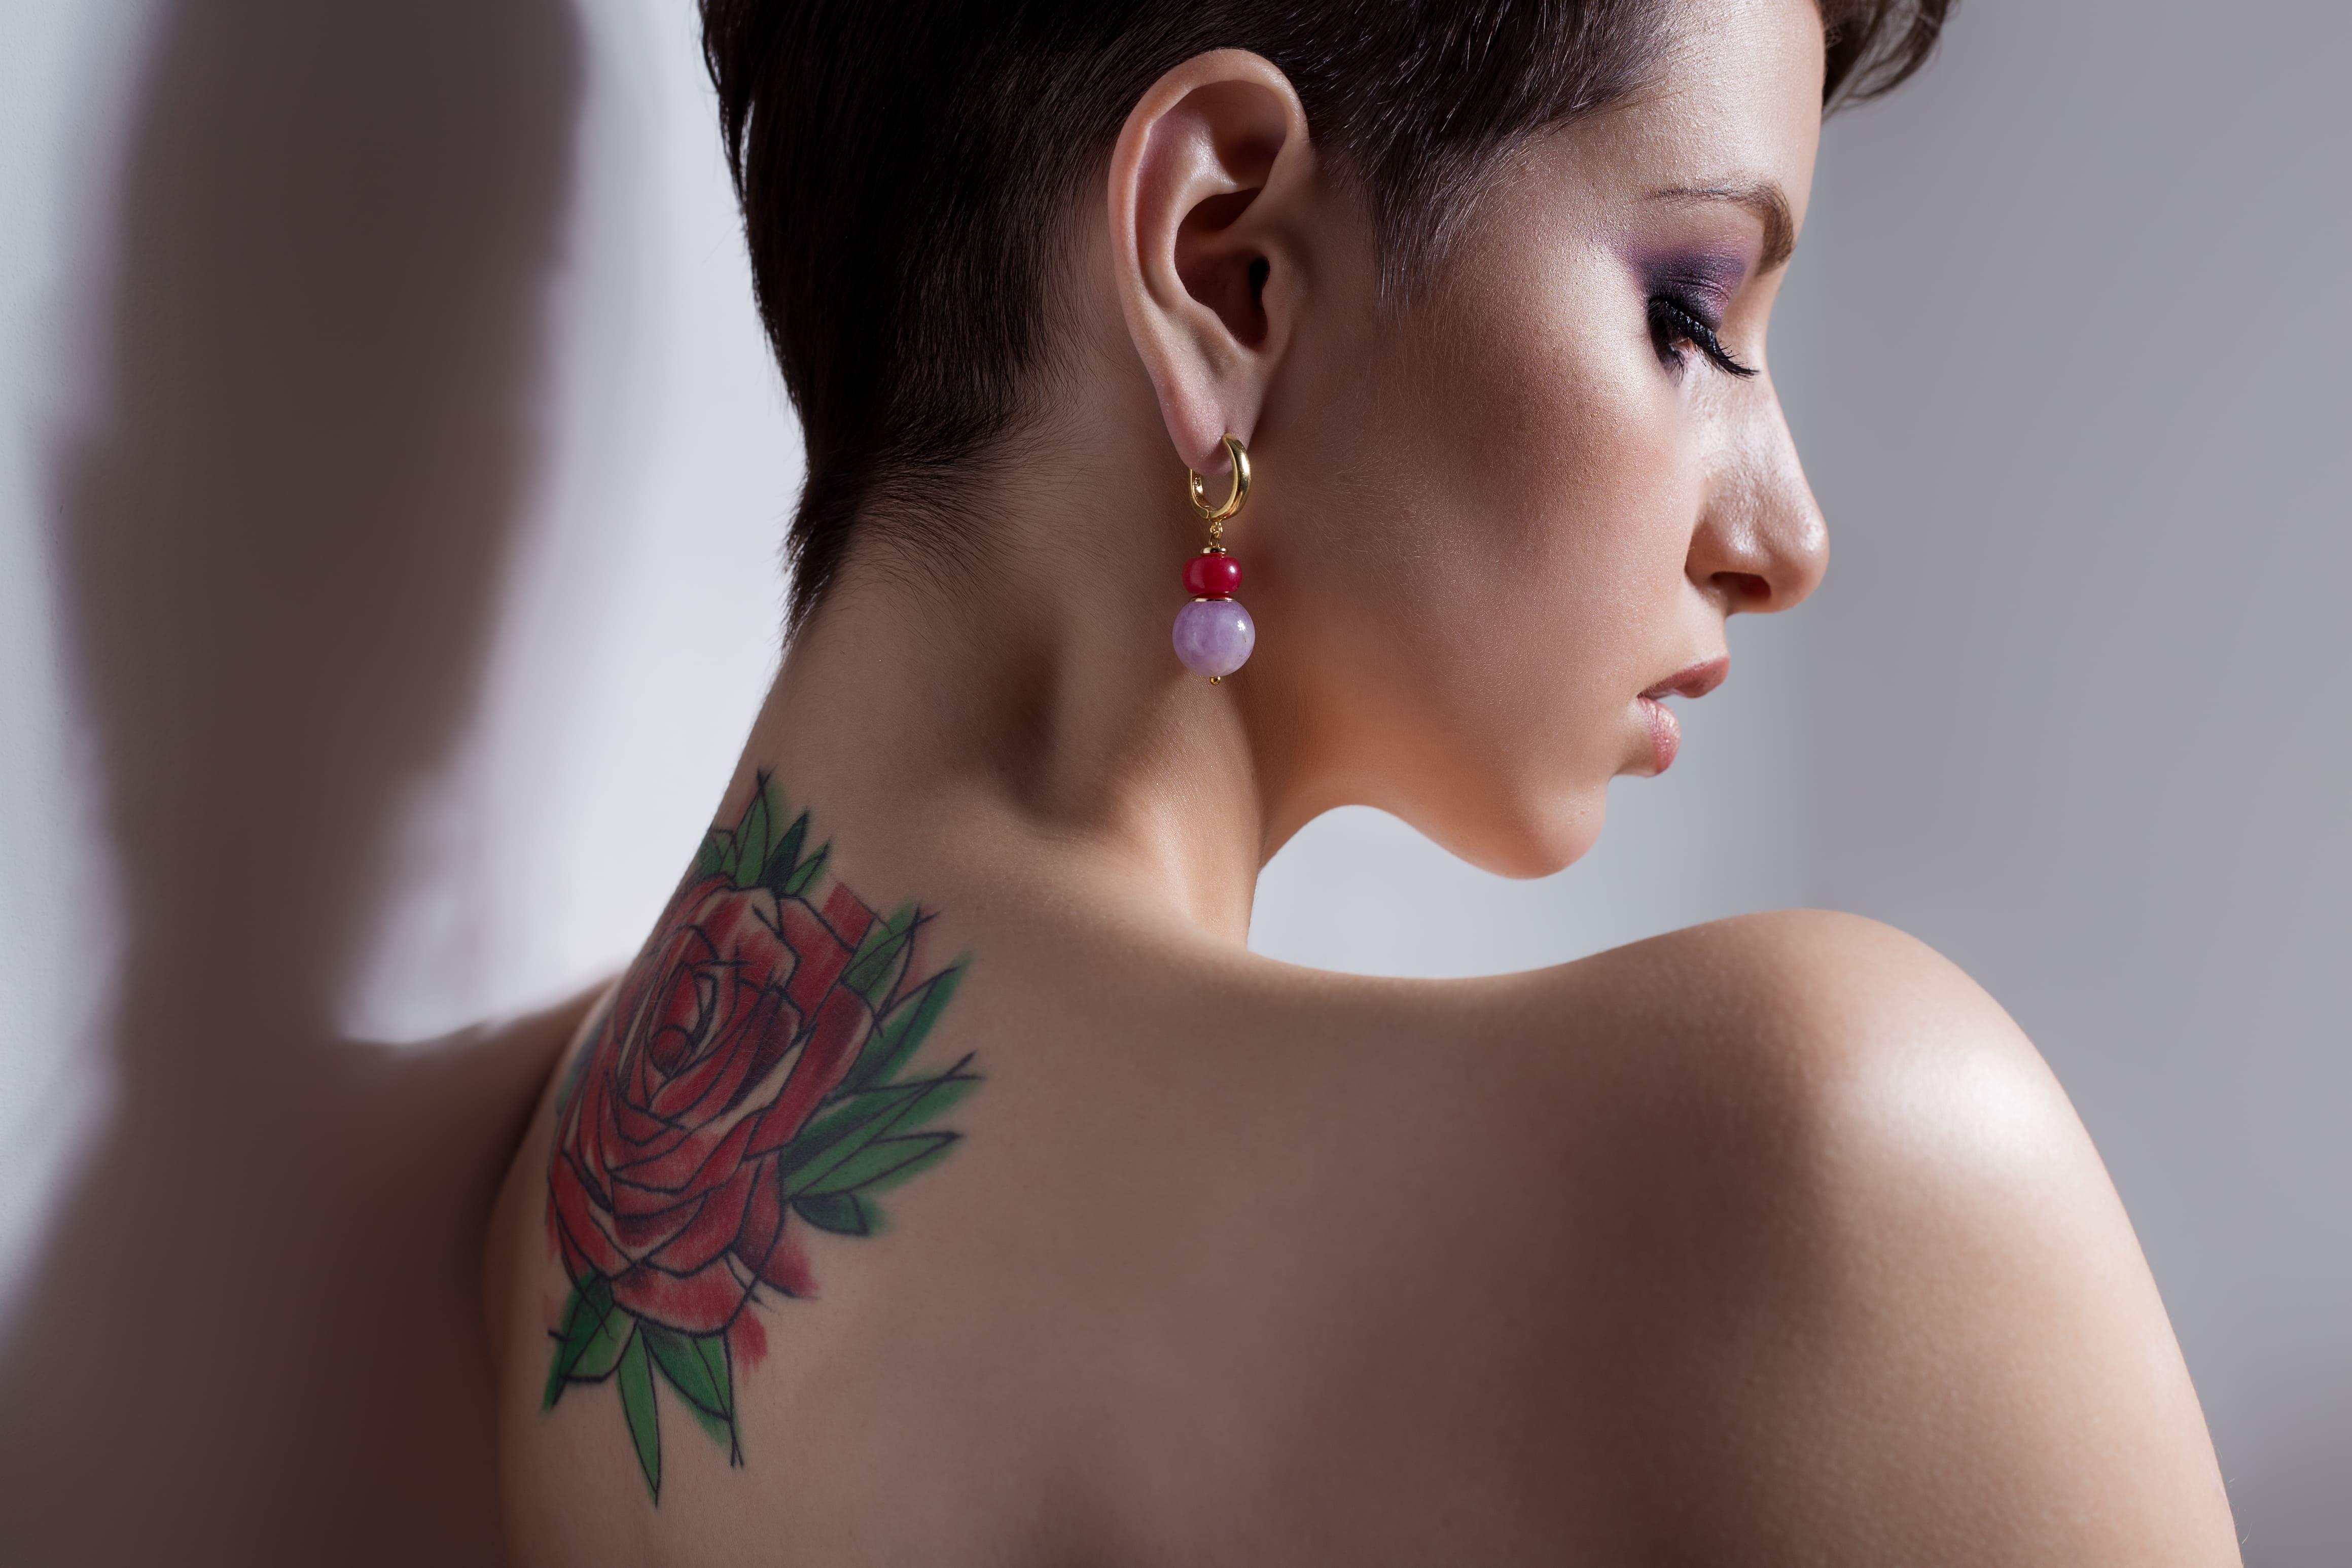 Tattoo Design Ideas for Girls - 6